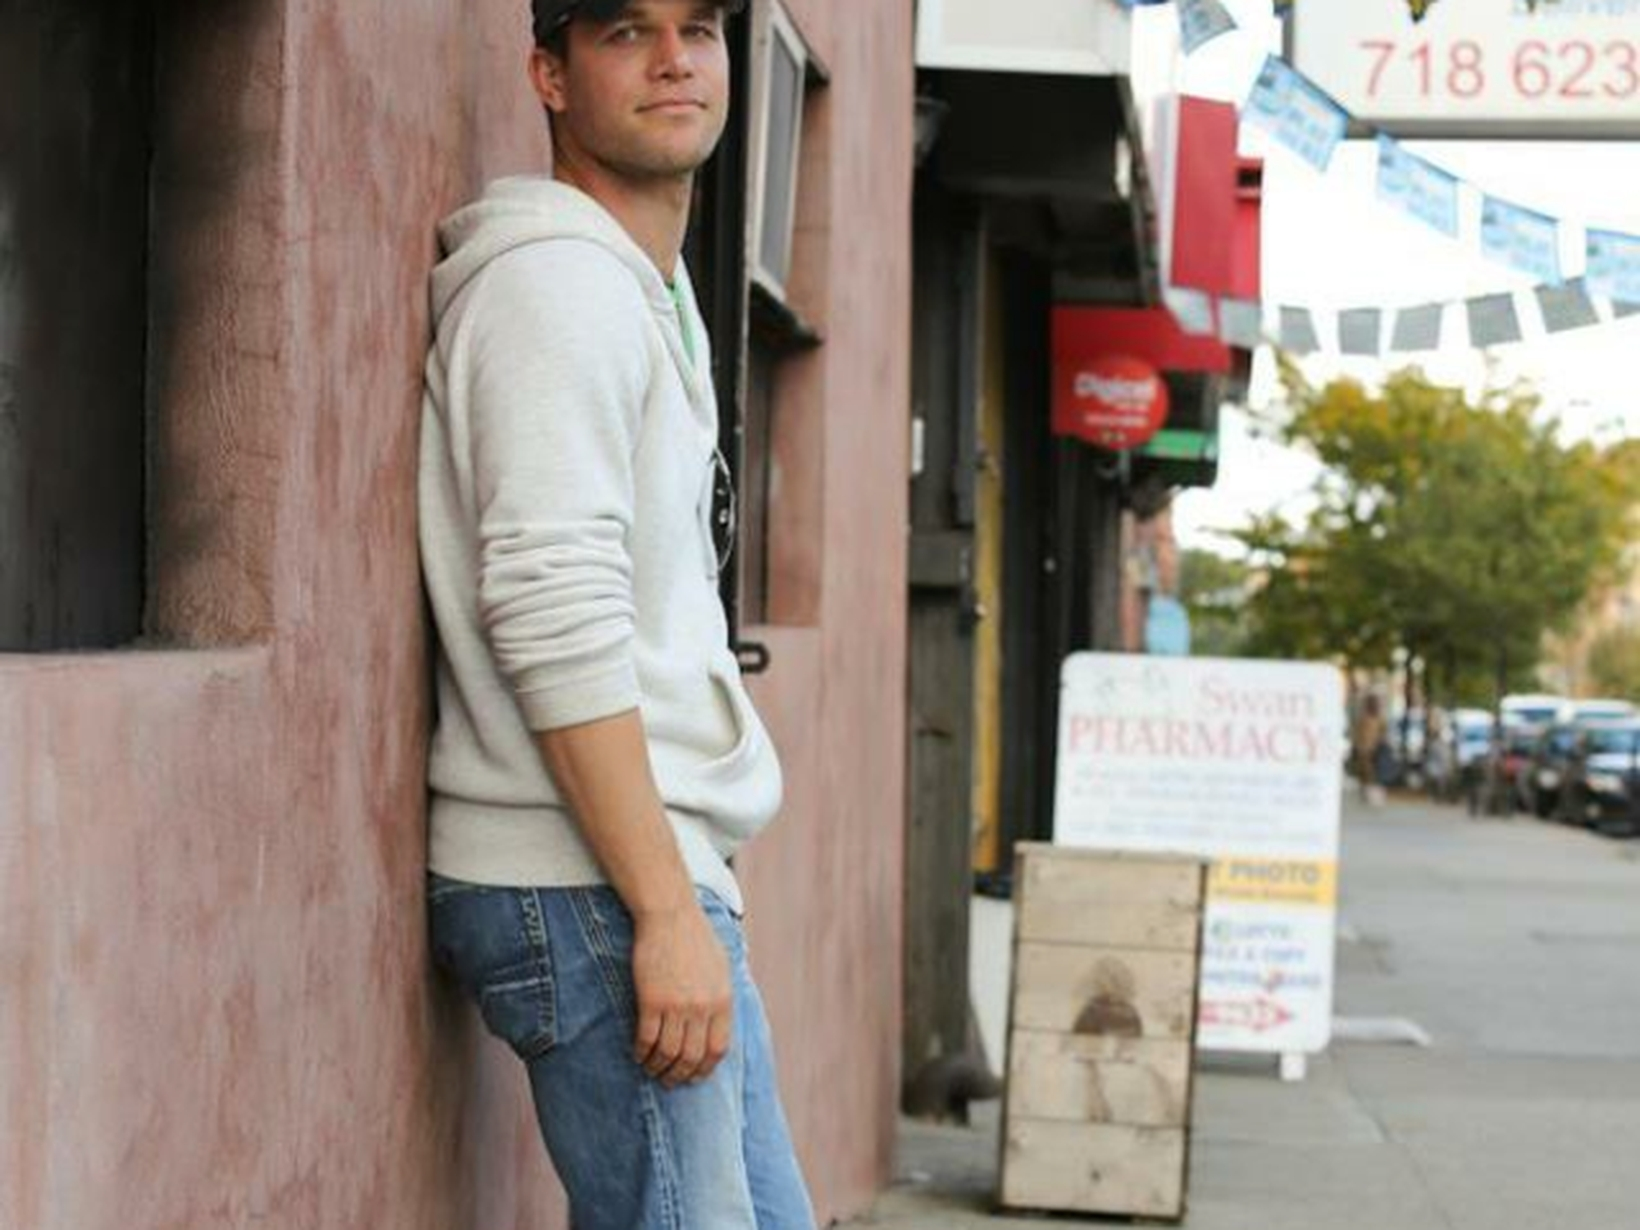 Zachary from New York City, New York, United States